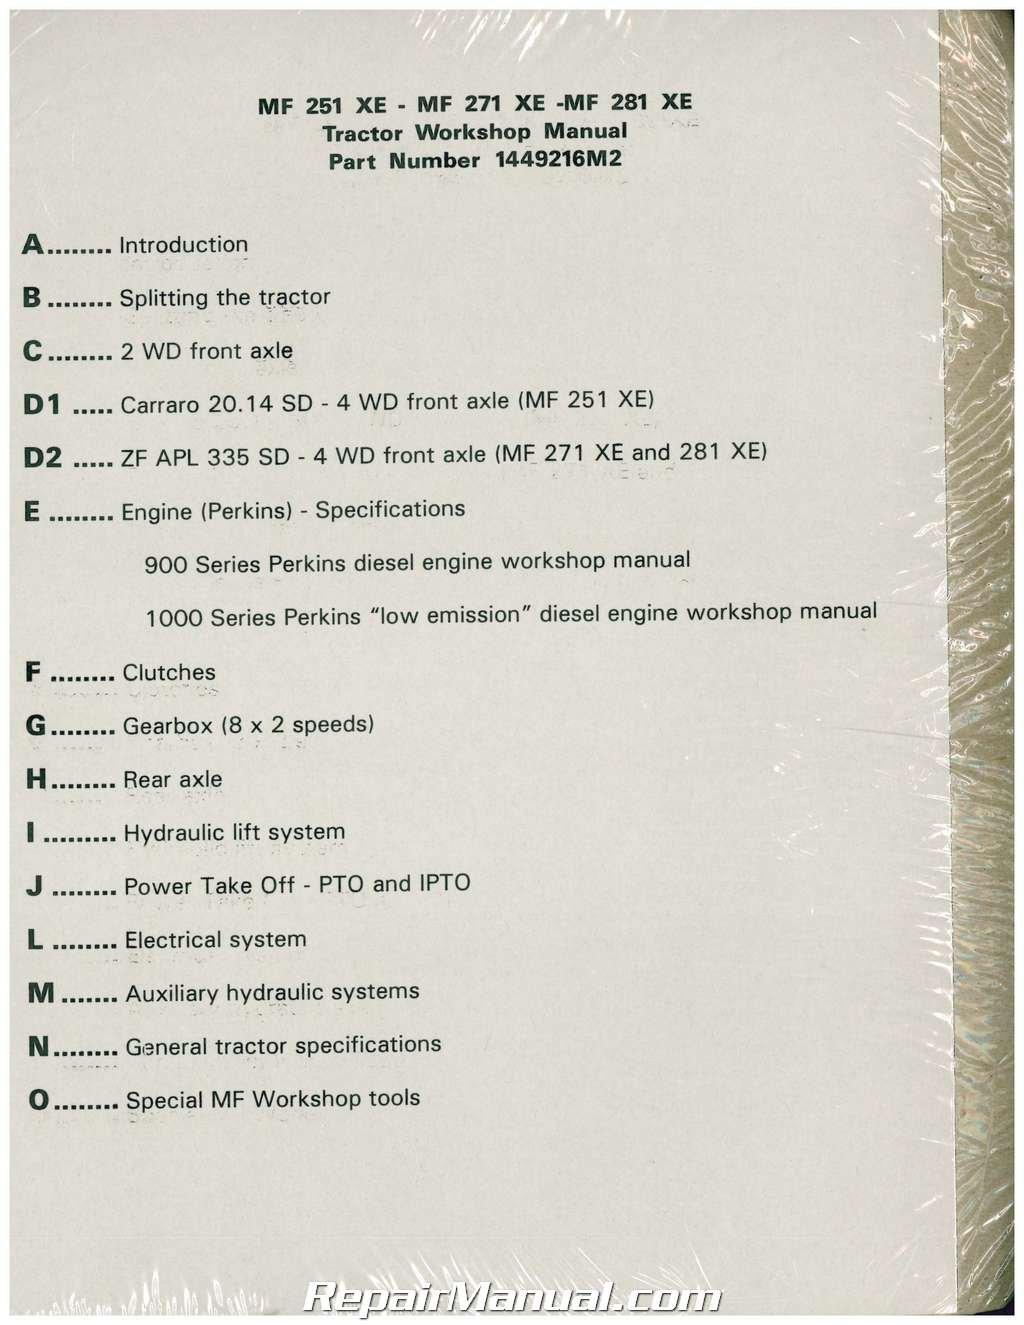 JS-MH-S-MF251XE-PLUS Massey Ferguson 251XE 271XE 281XE